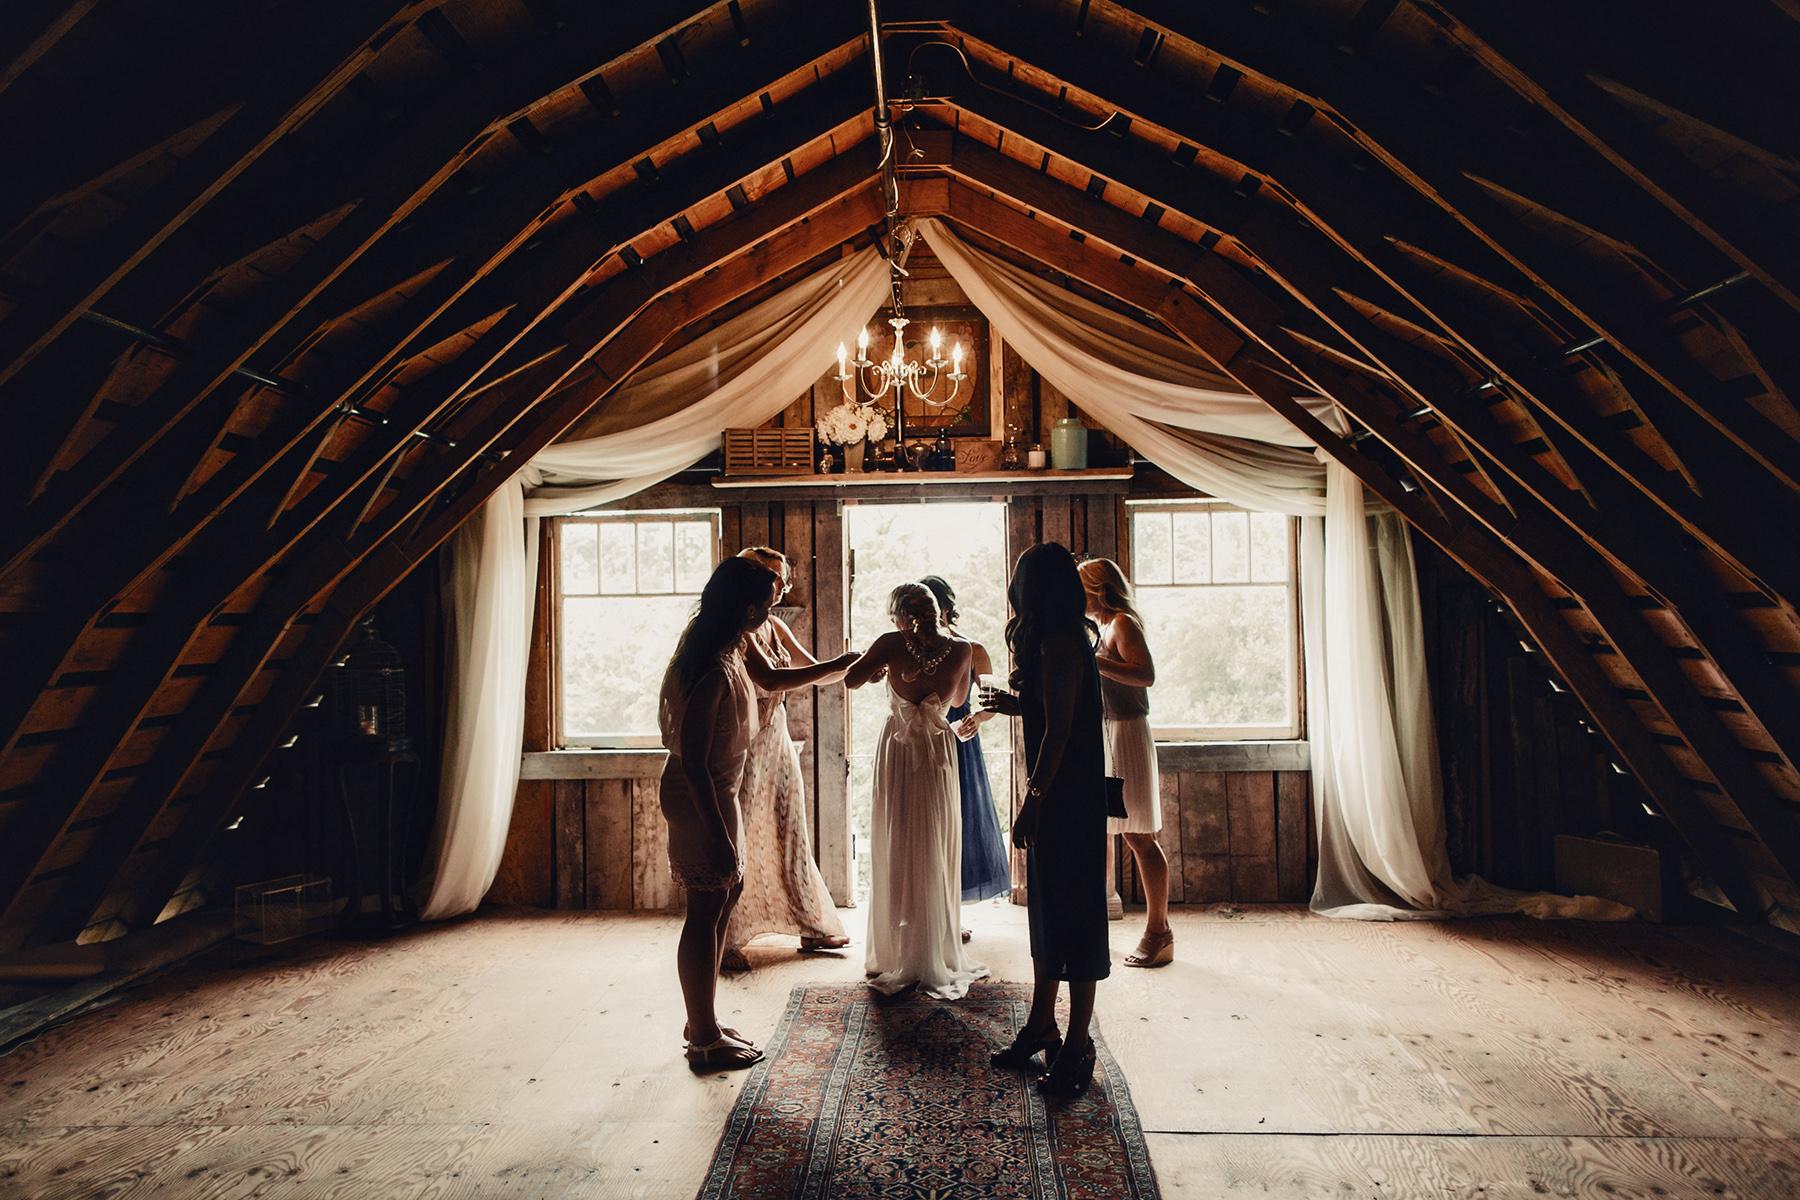 kildara-farms-wedding-photo-inspiration-0016